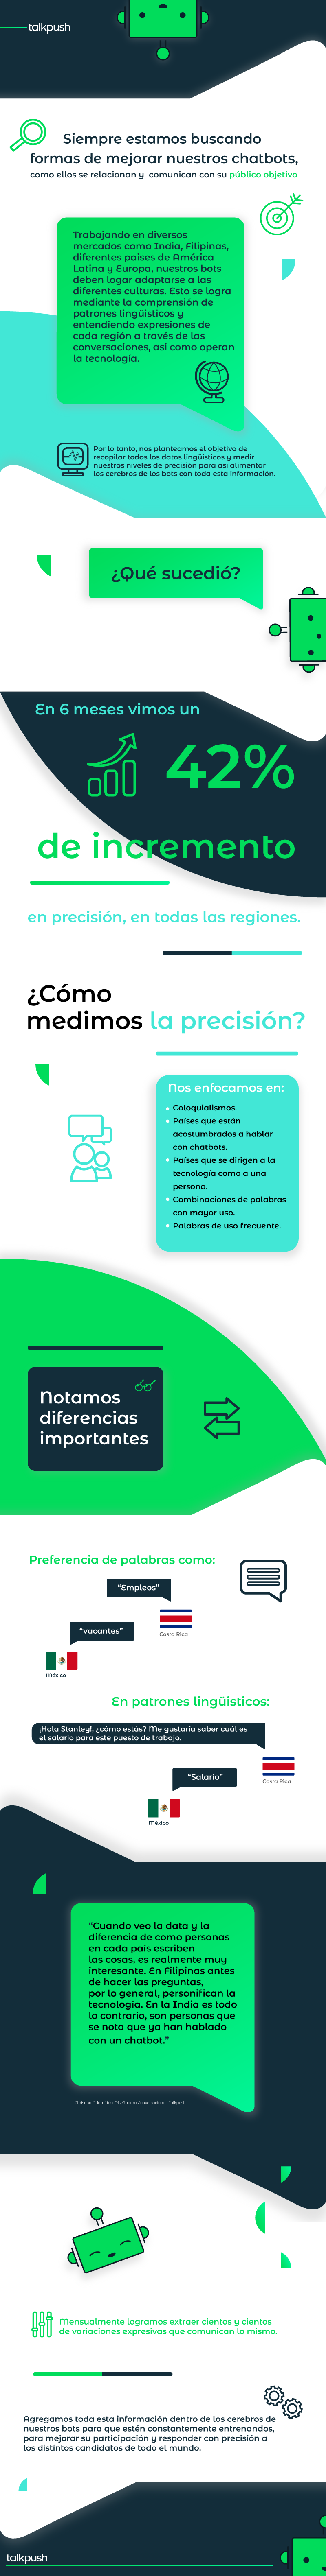 infografiaespañol (2)